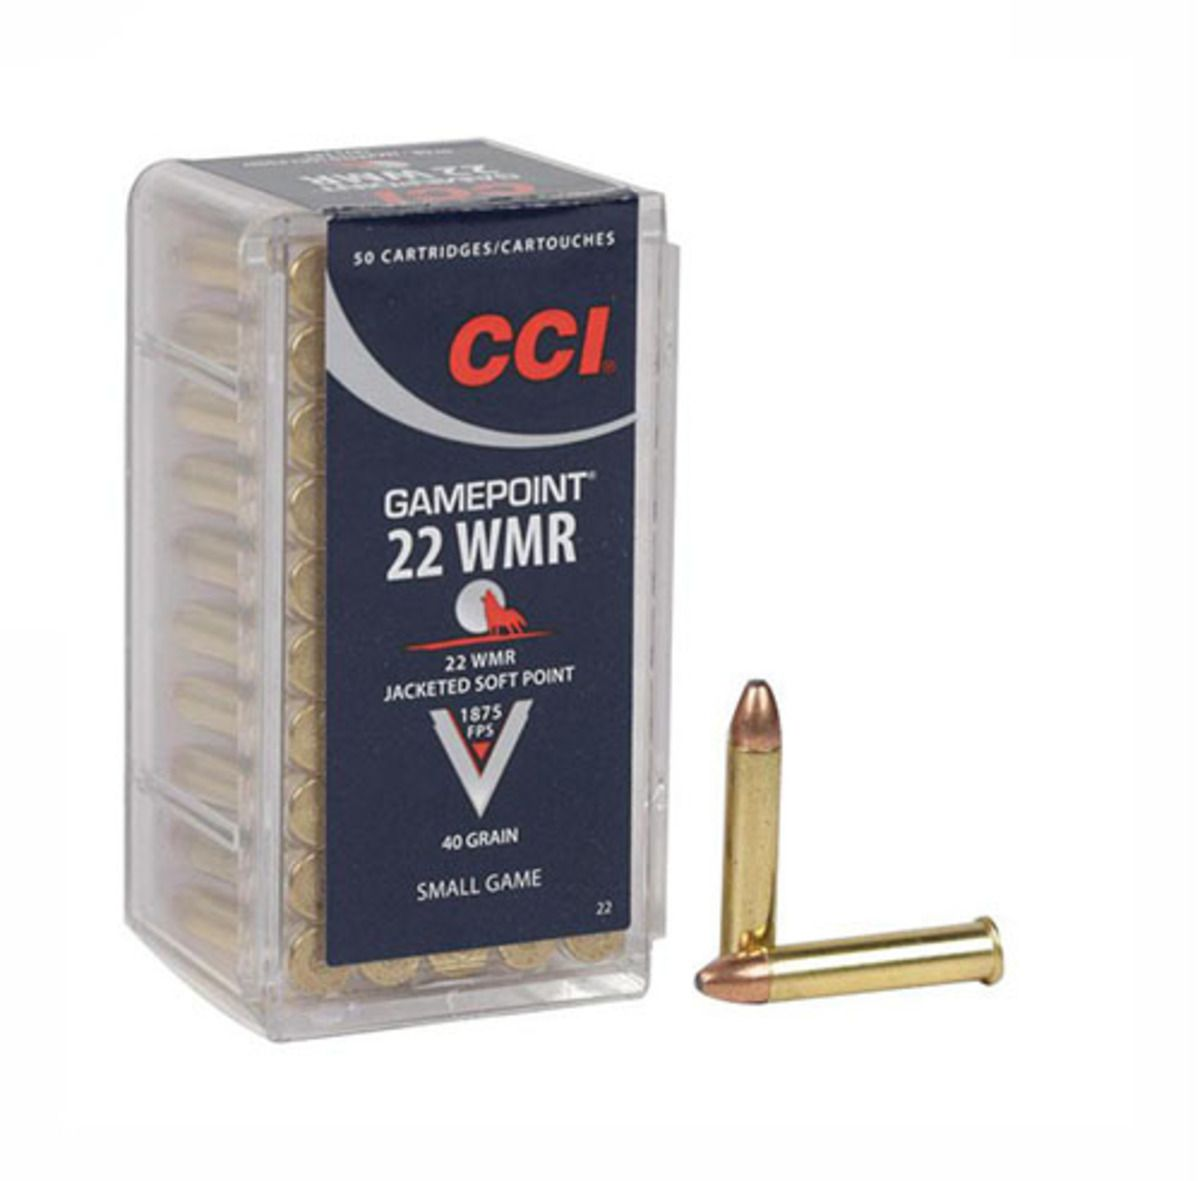 CART CCI .22 MAG GAMEPOINT JSP 40GRC